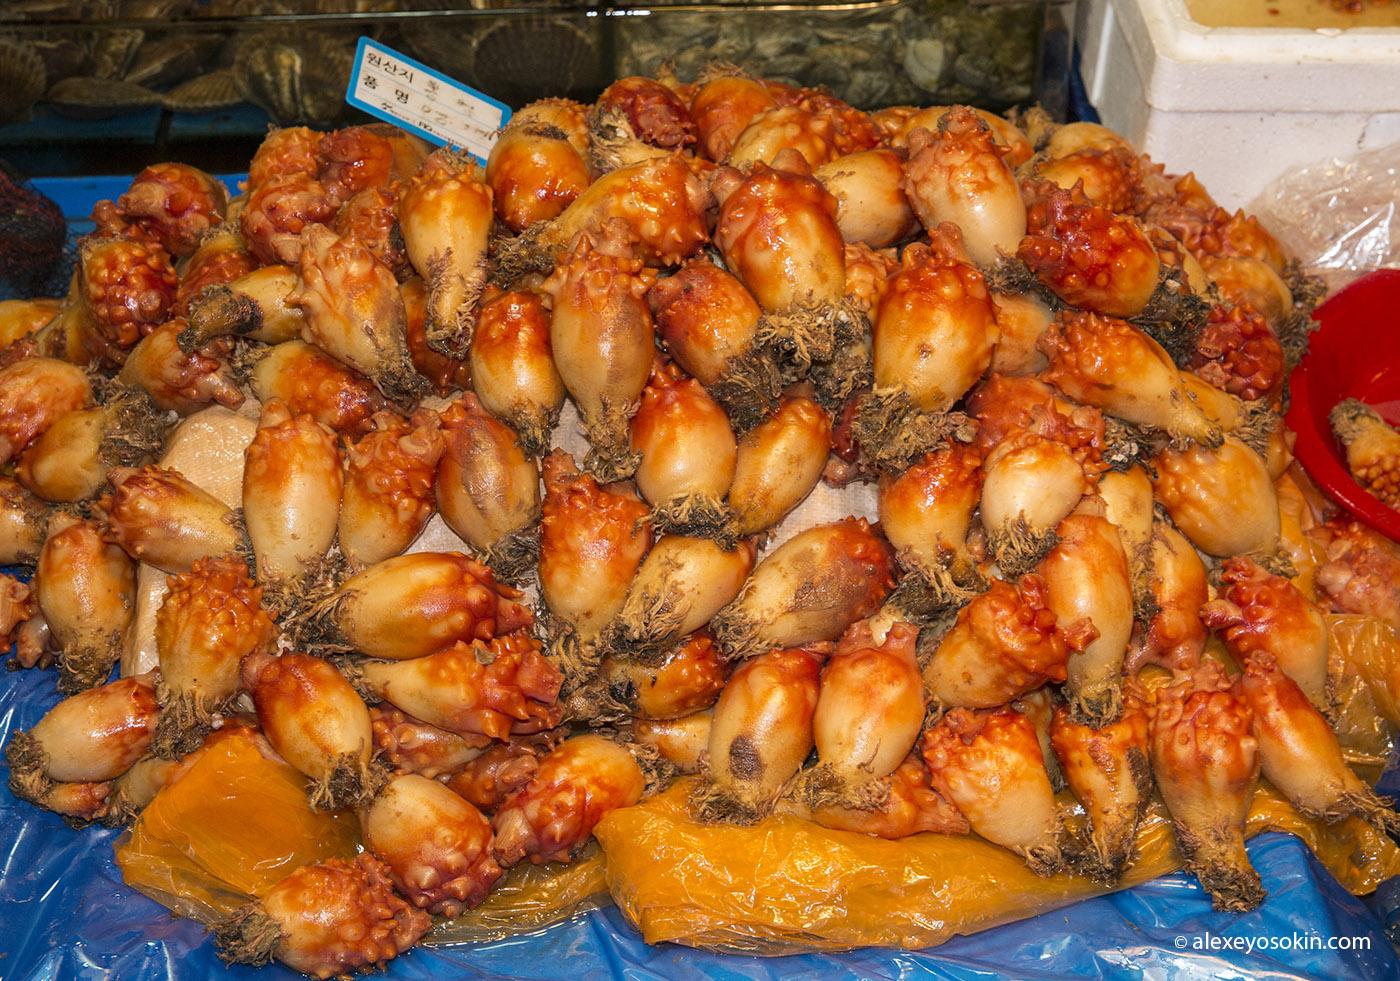 seoul_fish_market_9_ao